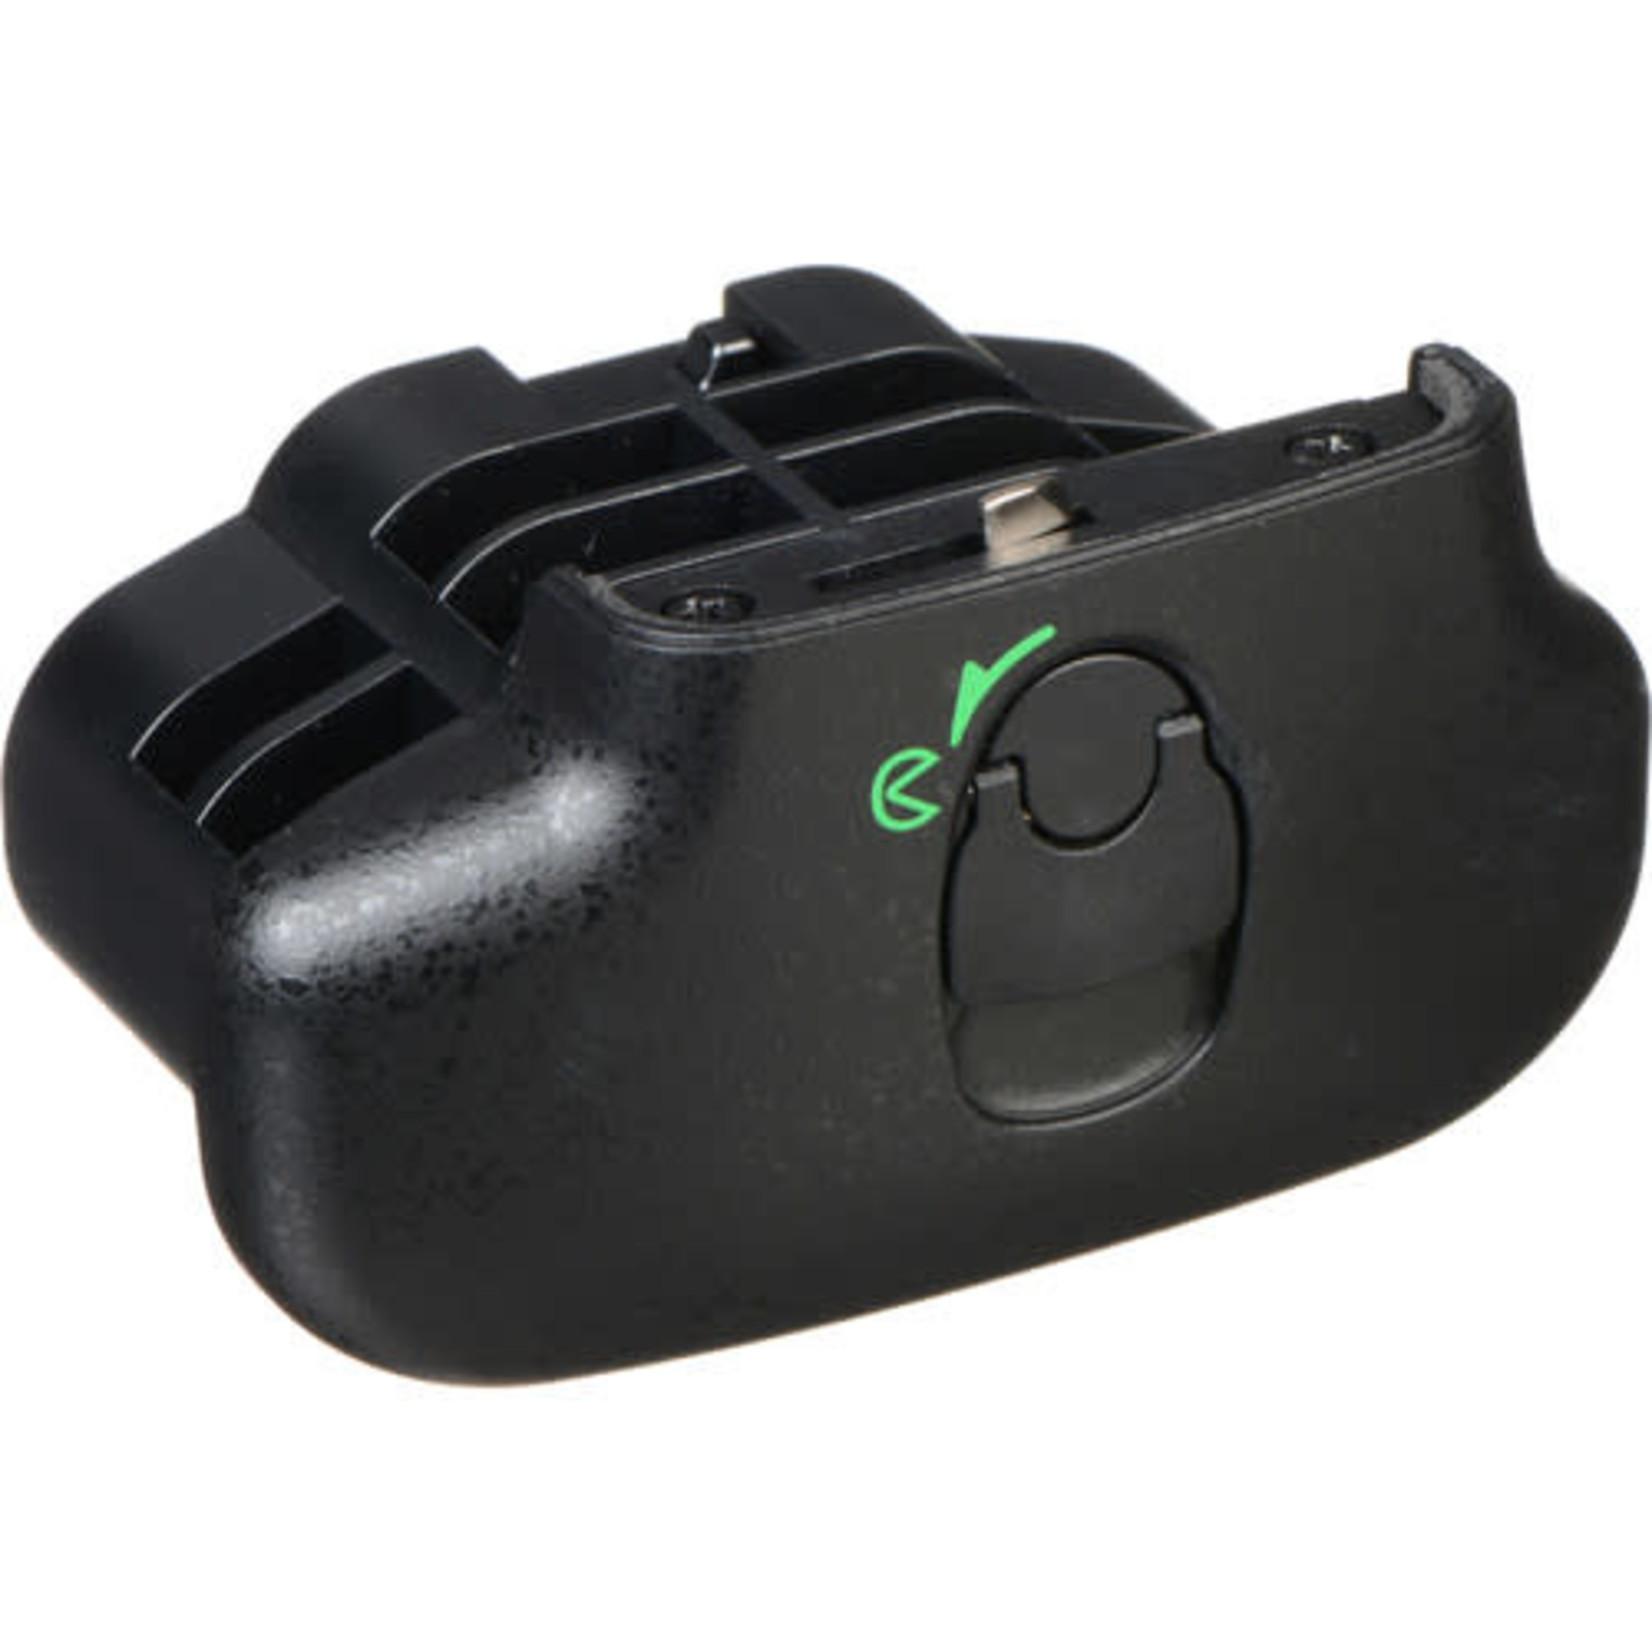 Nikon Nikon BL-3 Battery Chamber Cover for MB-D10, MB-40 Battery Packs